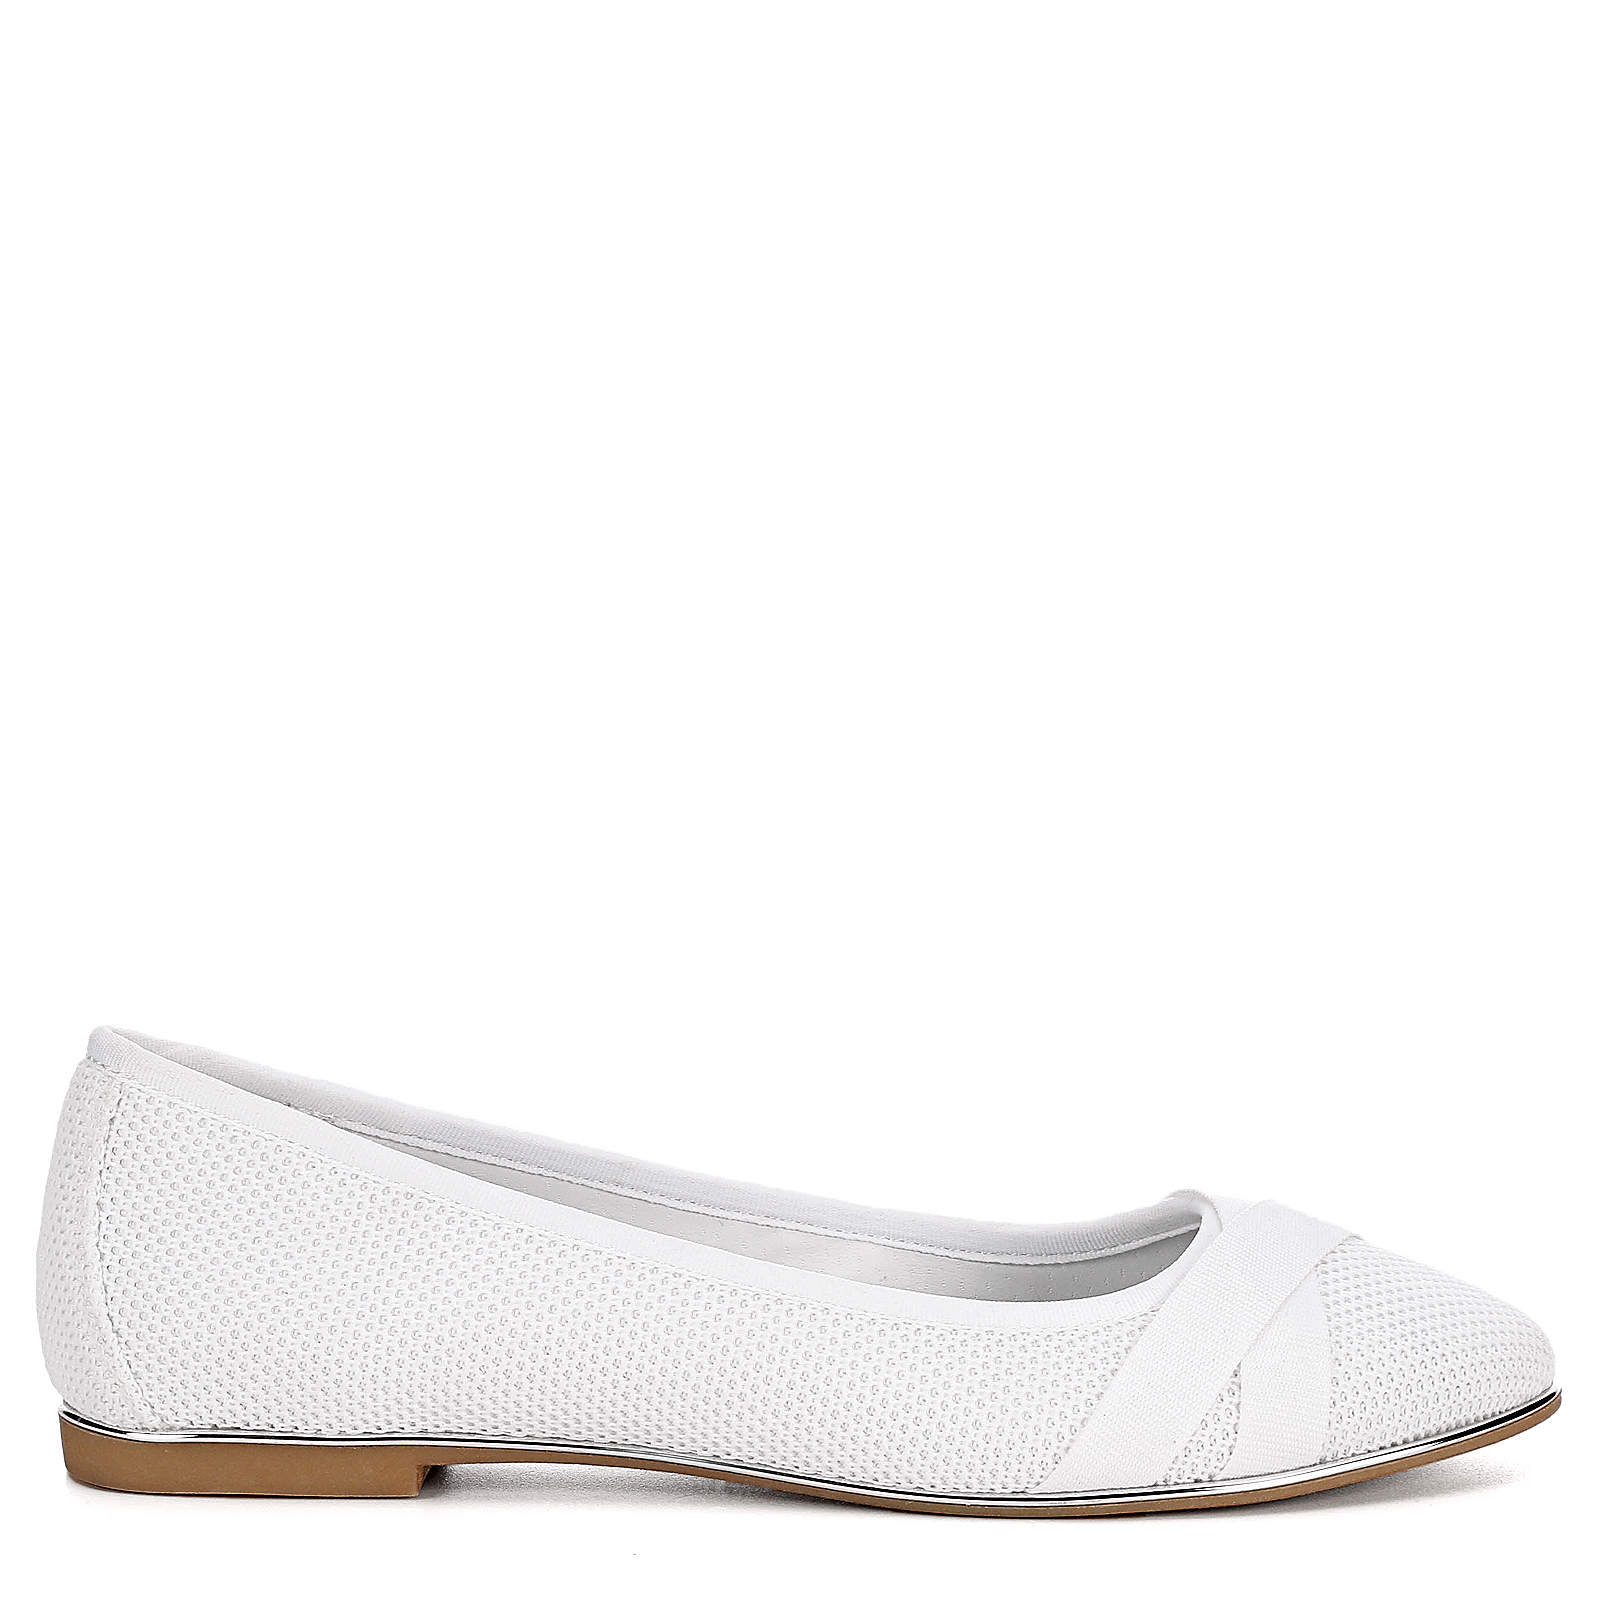 XAPPEAL-Womens-Mitzie-Slip-On-Mesh-Flat-Shoes thumbnail 10